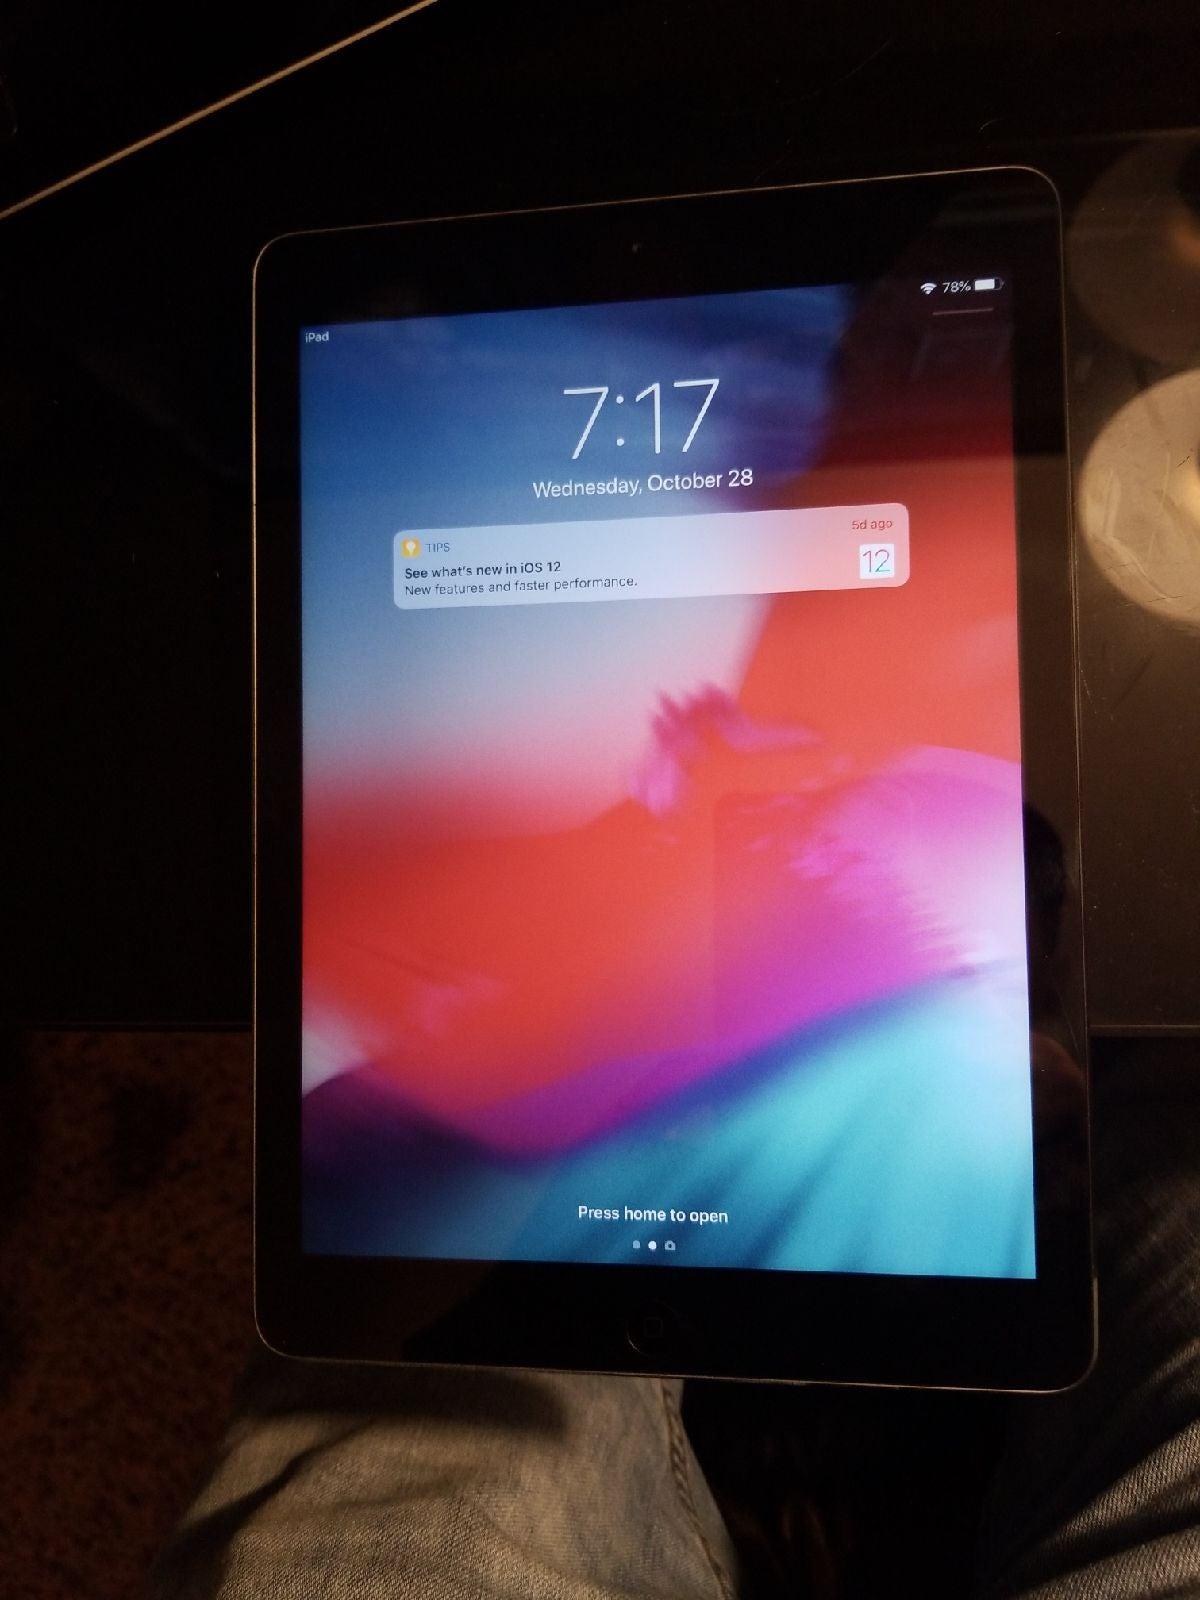 Mint cond. iPad air 32g works 100%